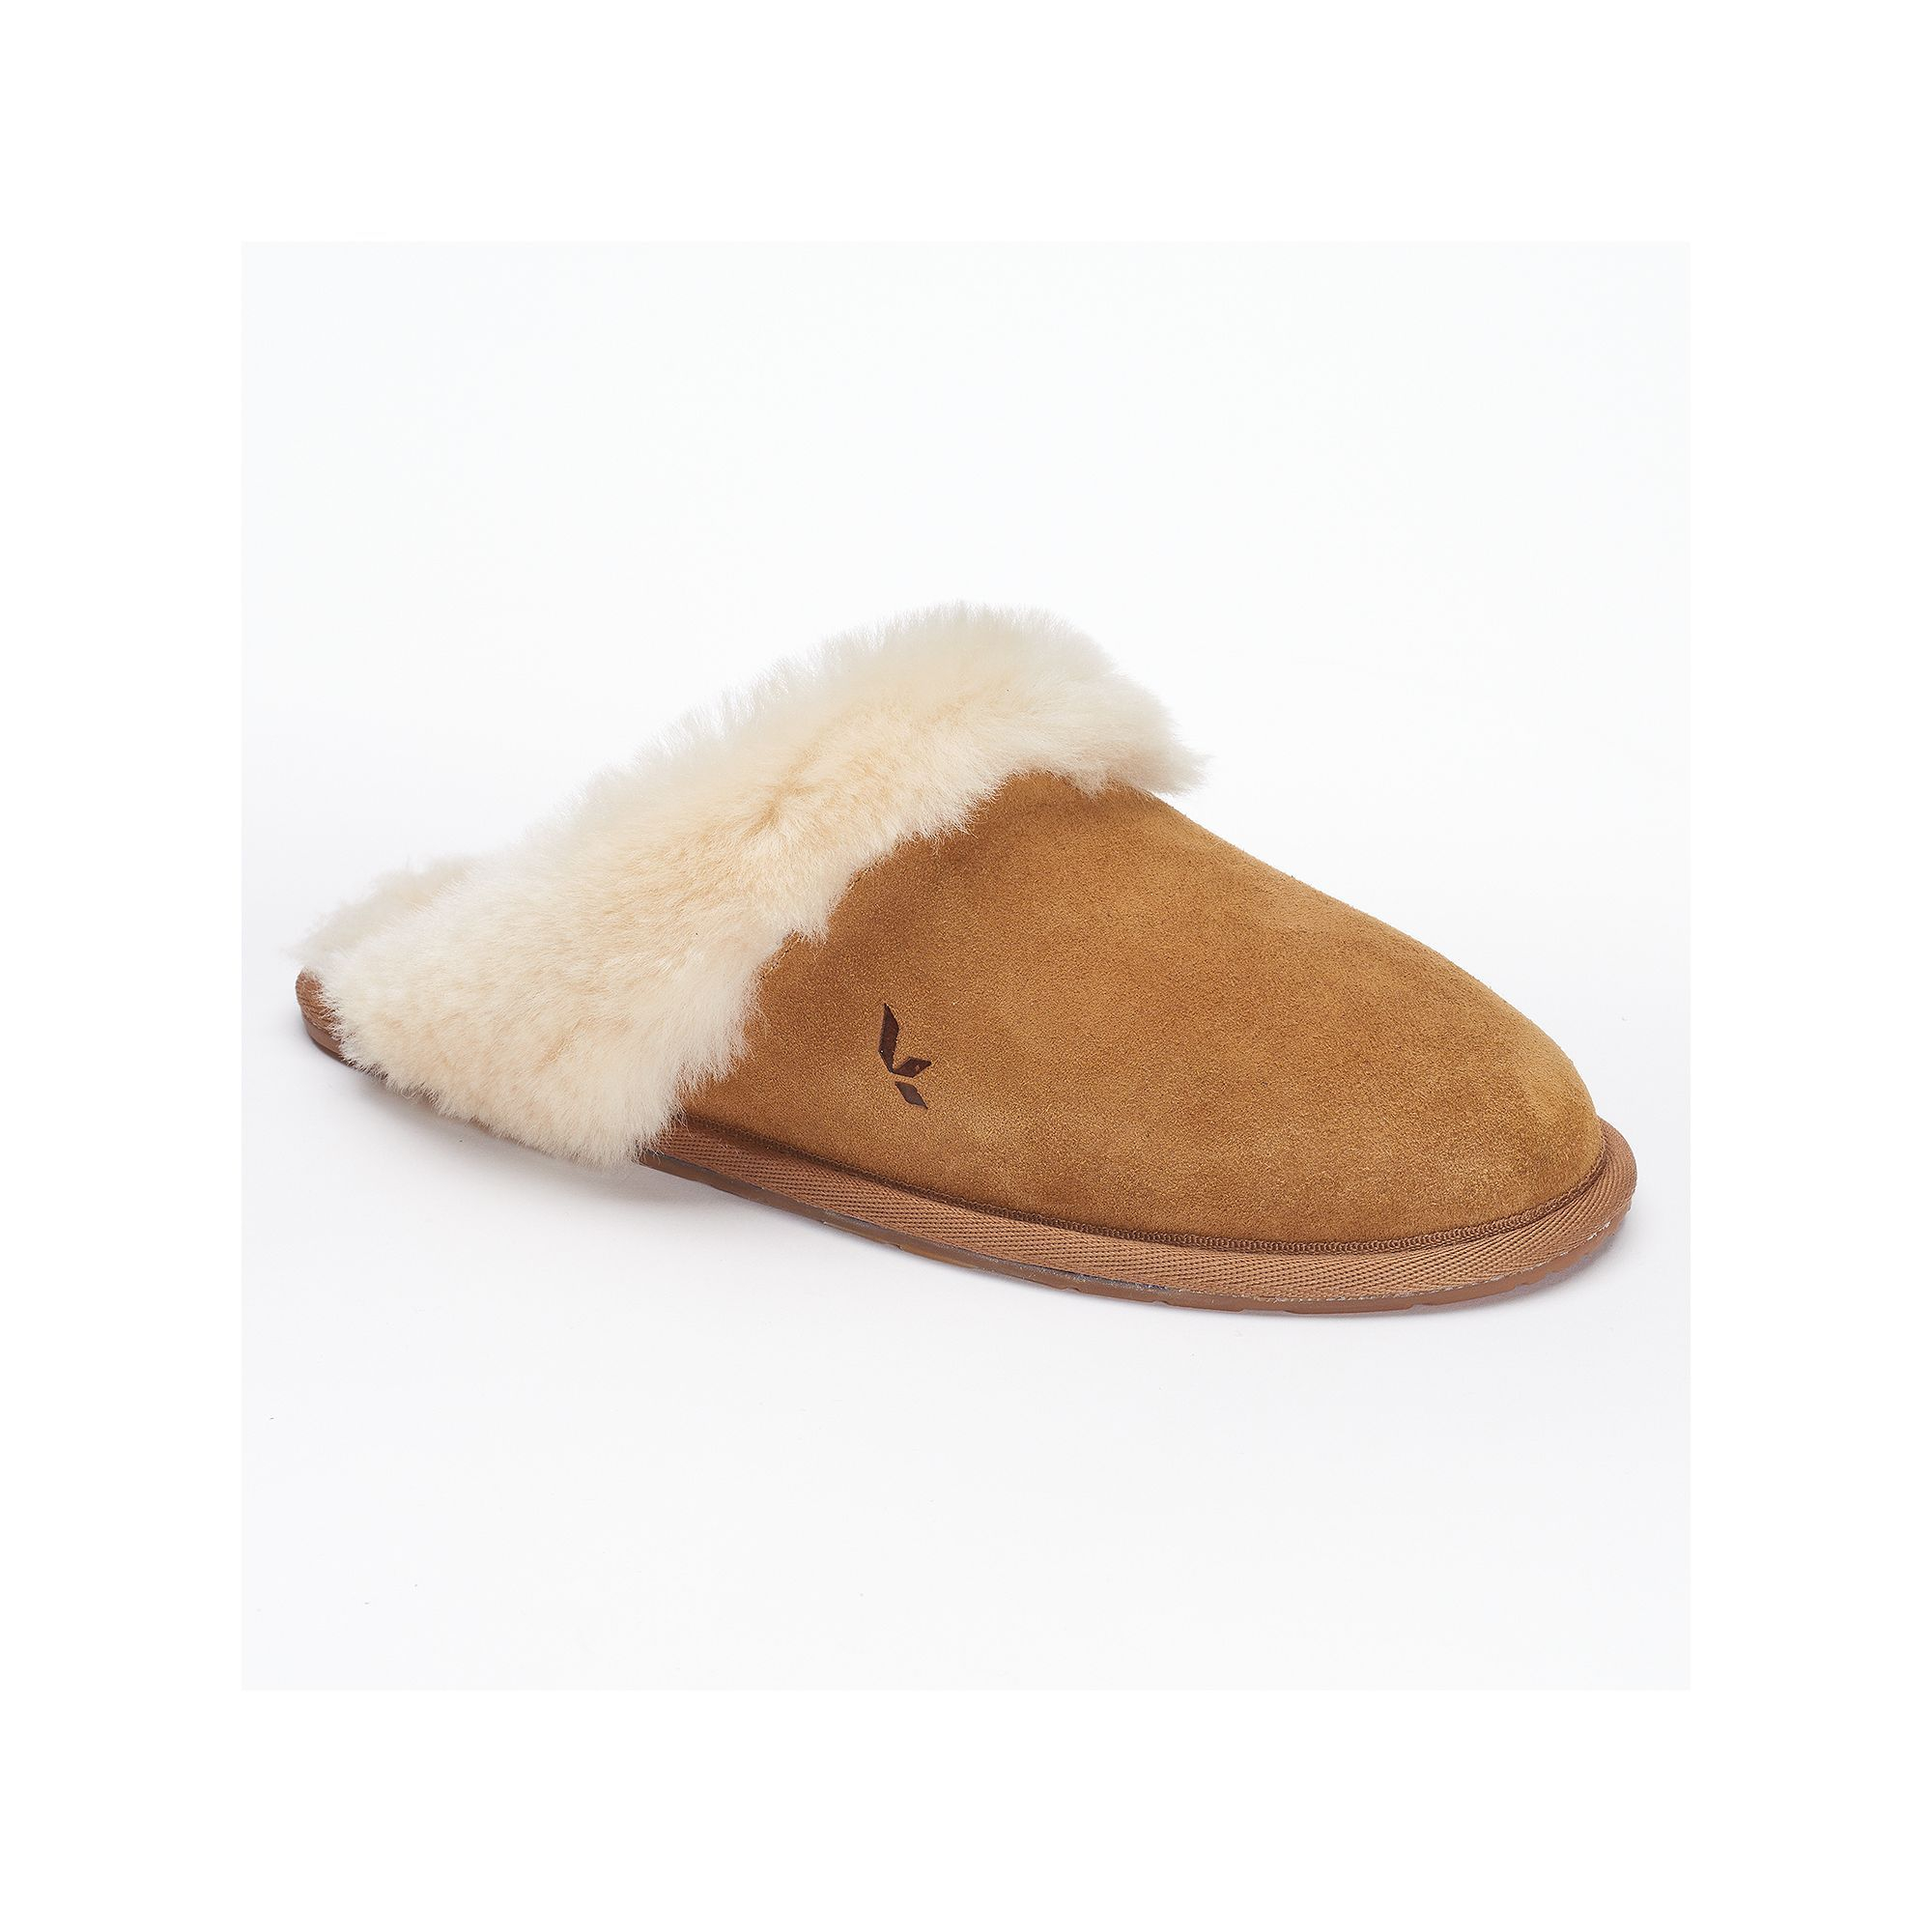 5569b0a796d Koolaburra by UGG Milo Women's Scuff Slippers, Size: 10, Med Brown ...